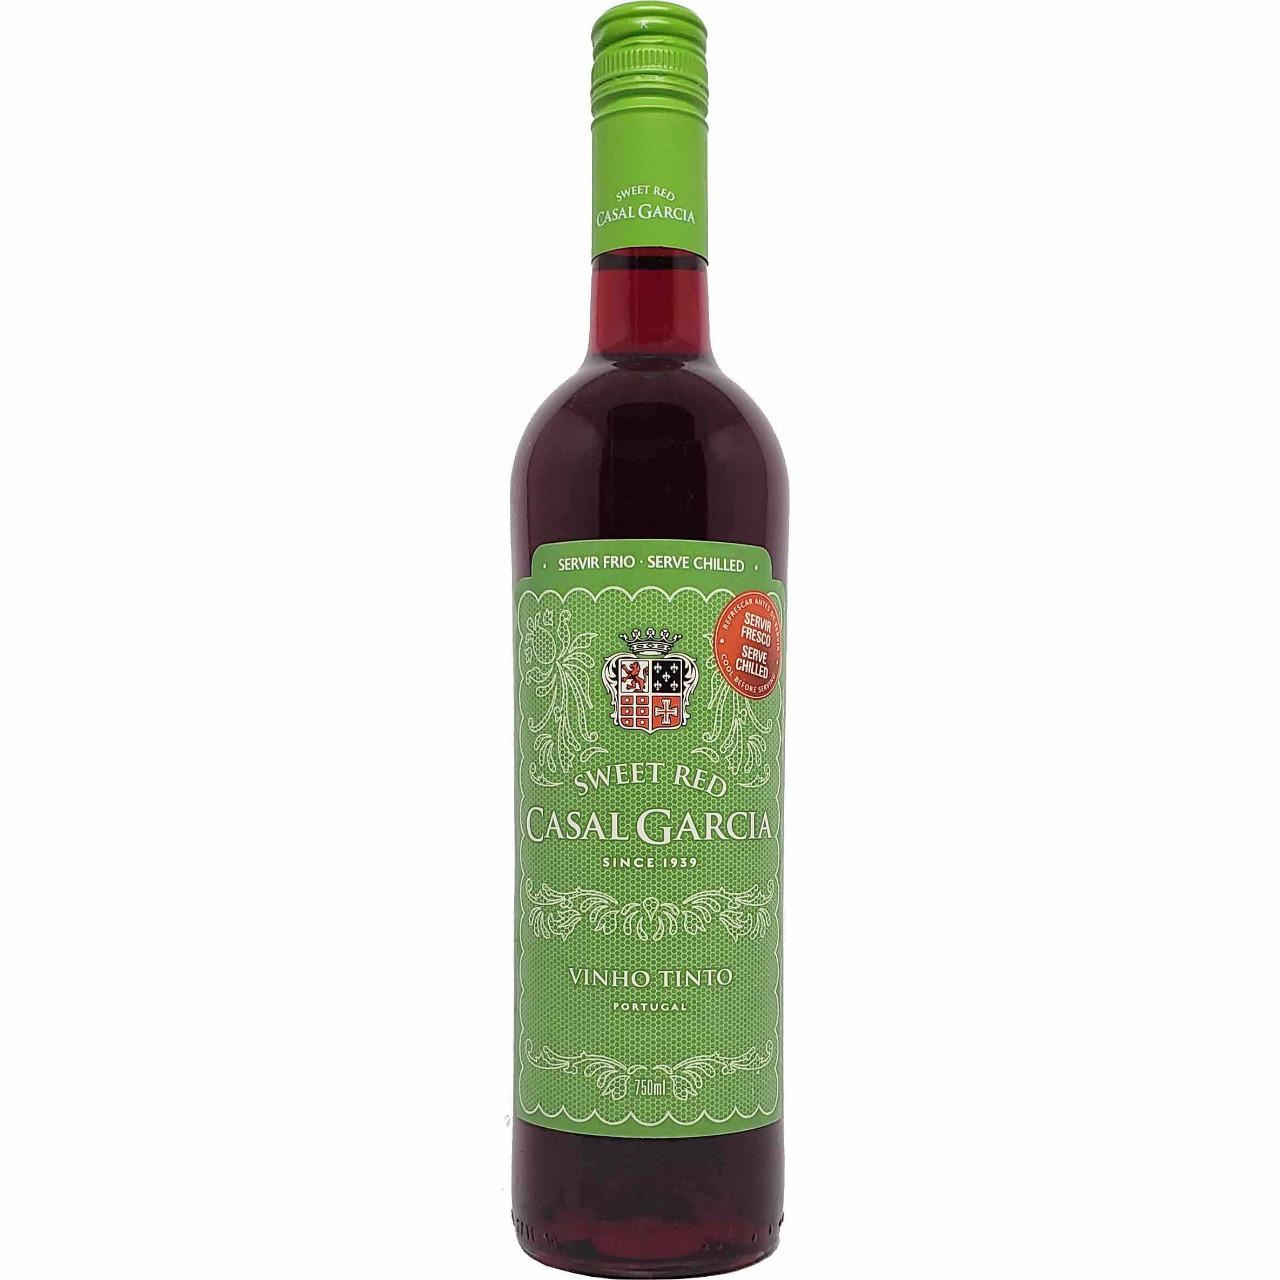 Vinho Tinto Sweet Red Casal Garcia Douro - 750ml -